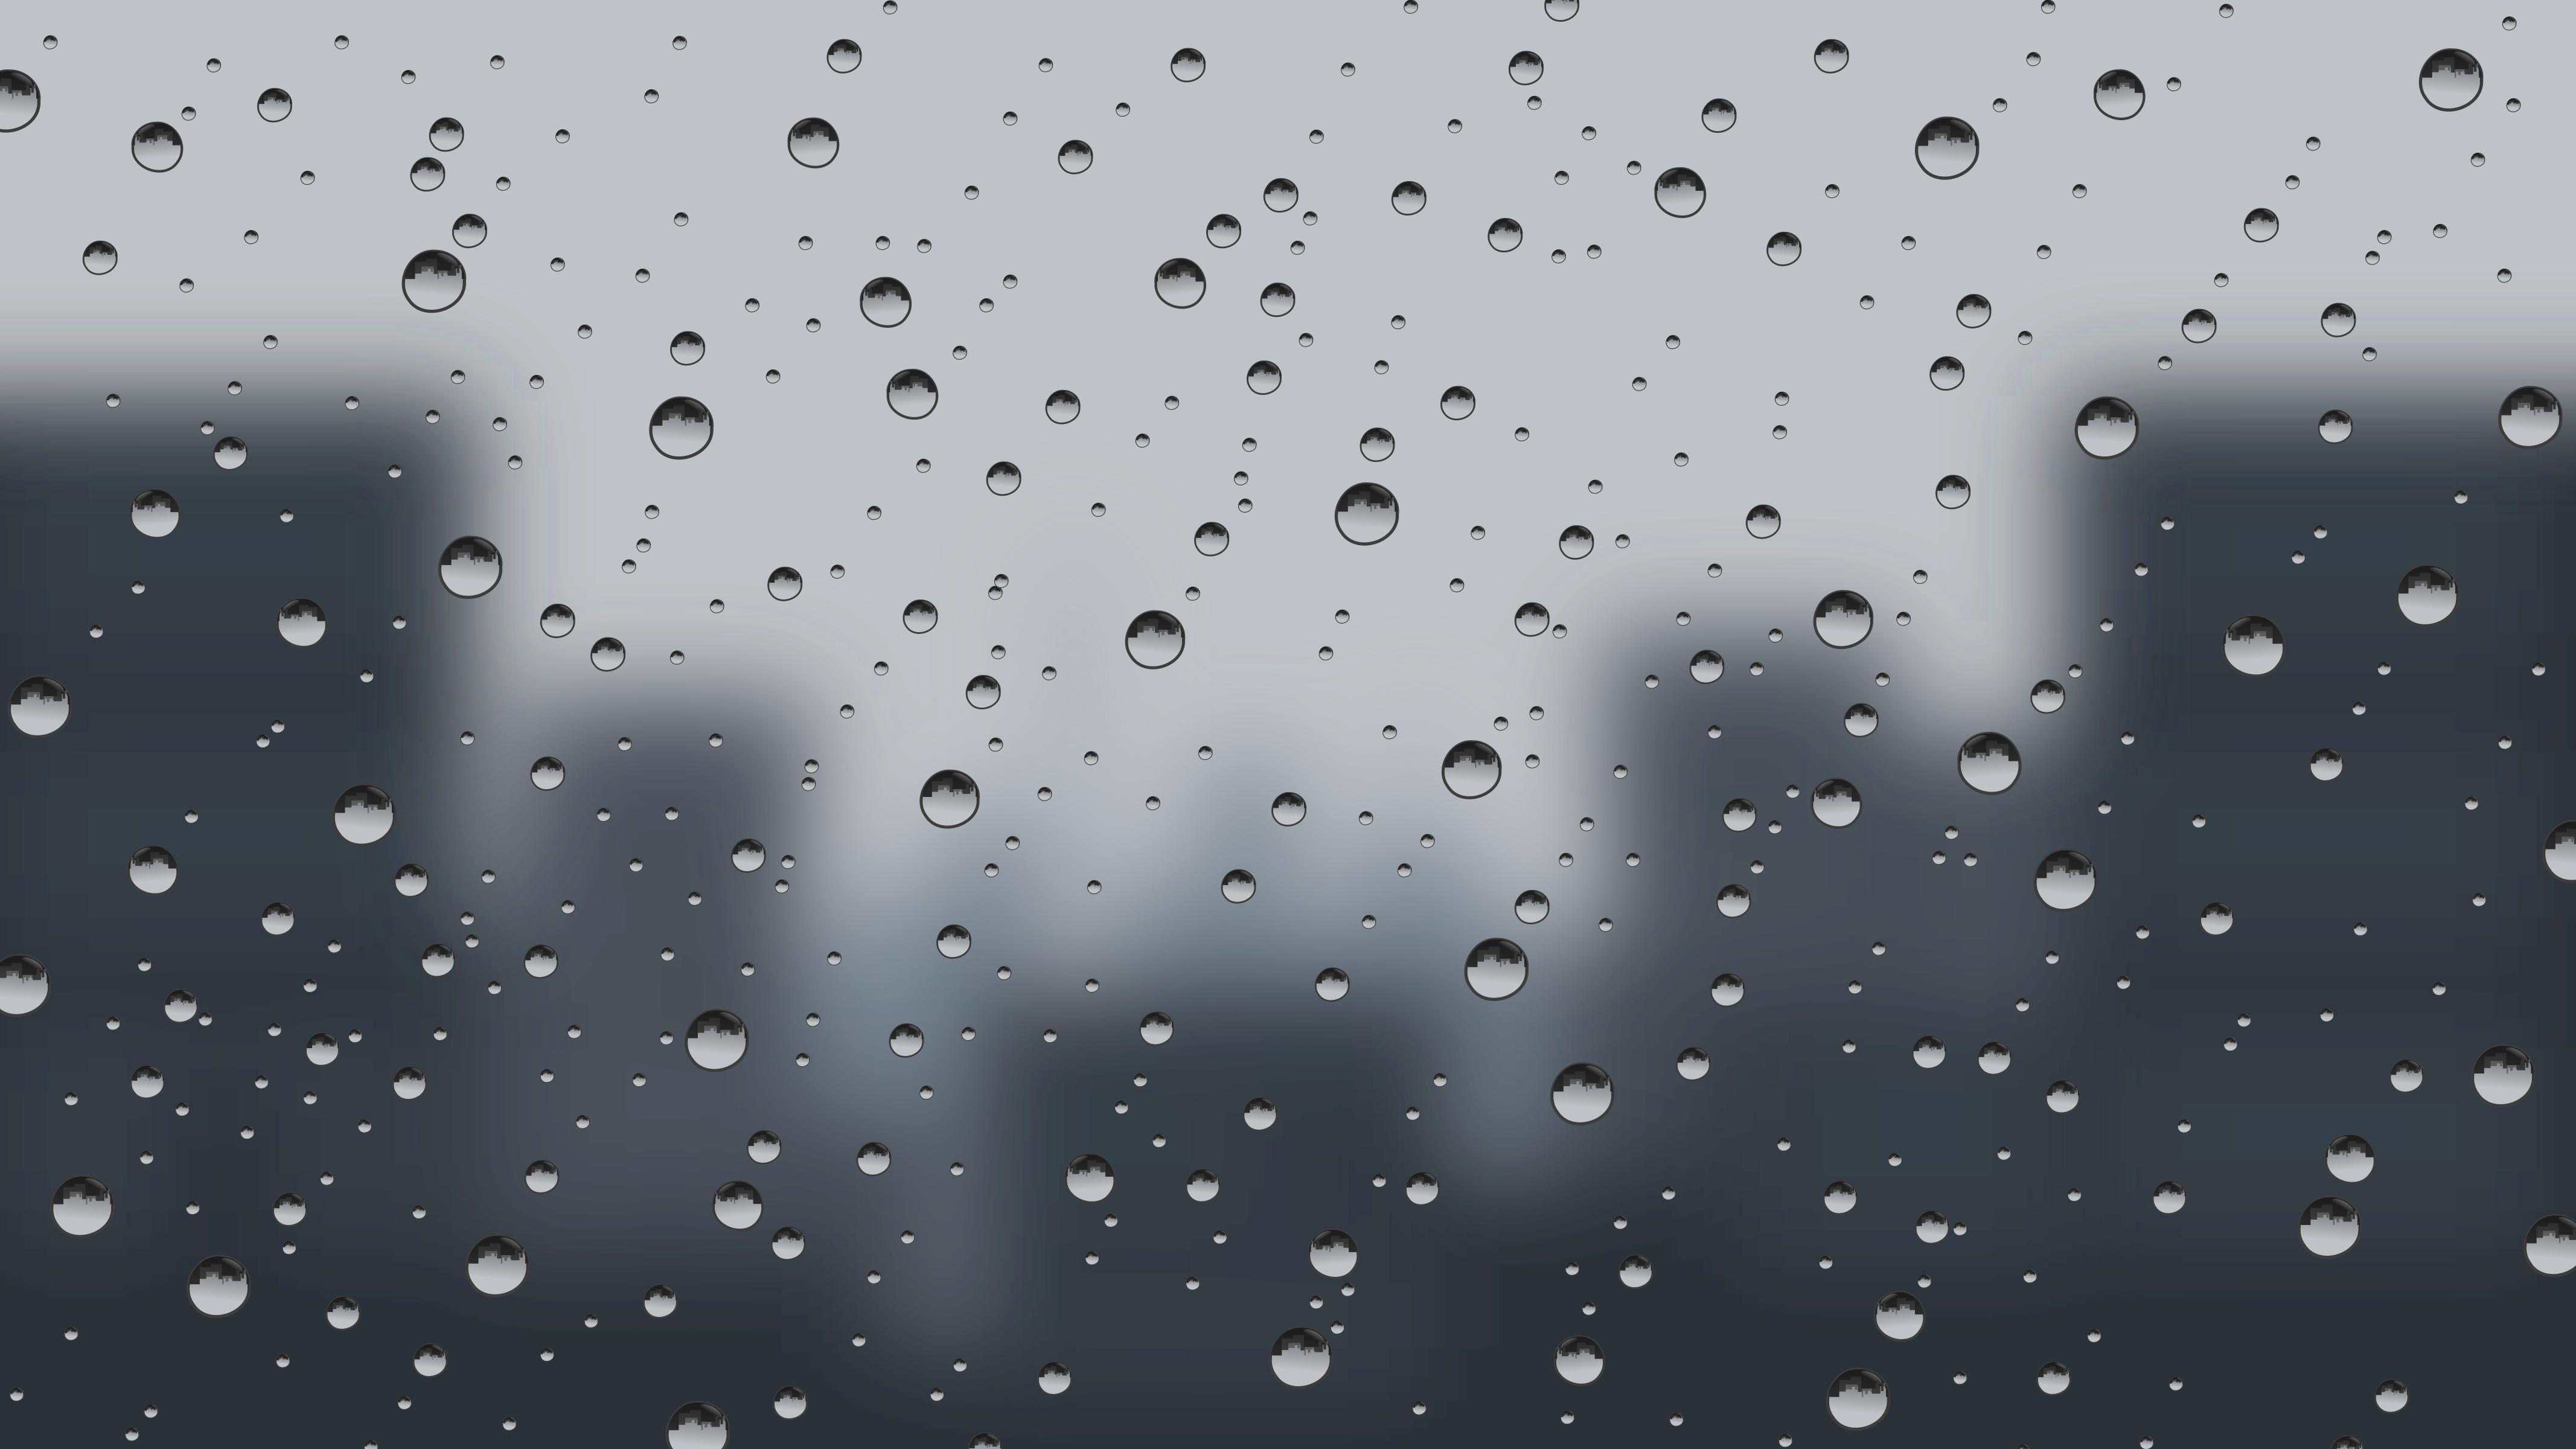 Raining Window Clipart.